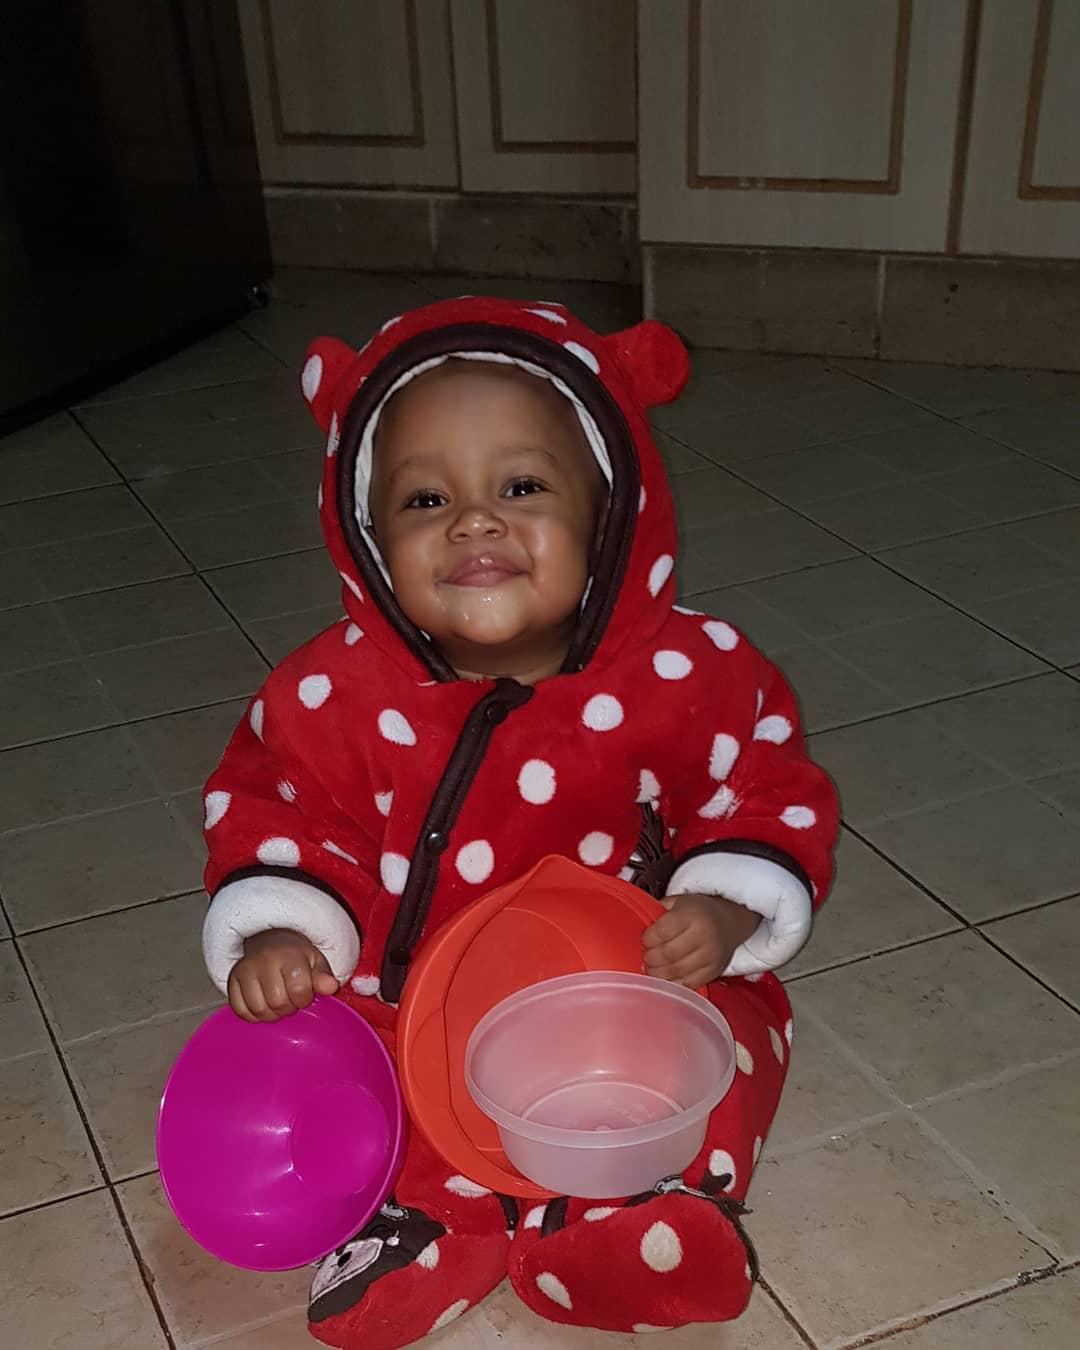 Isaac Mwaura's son